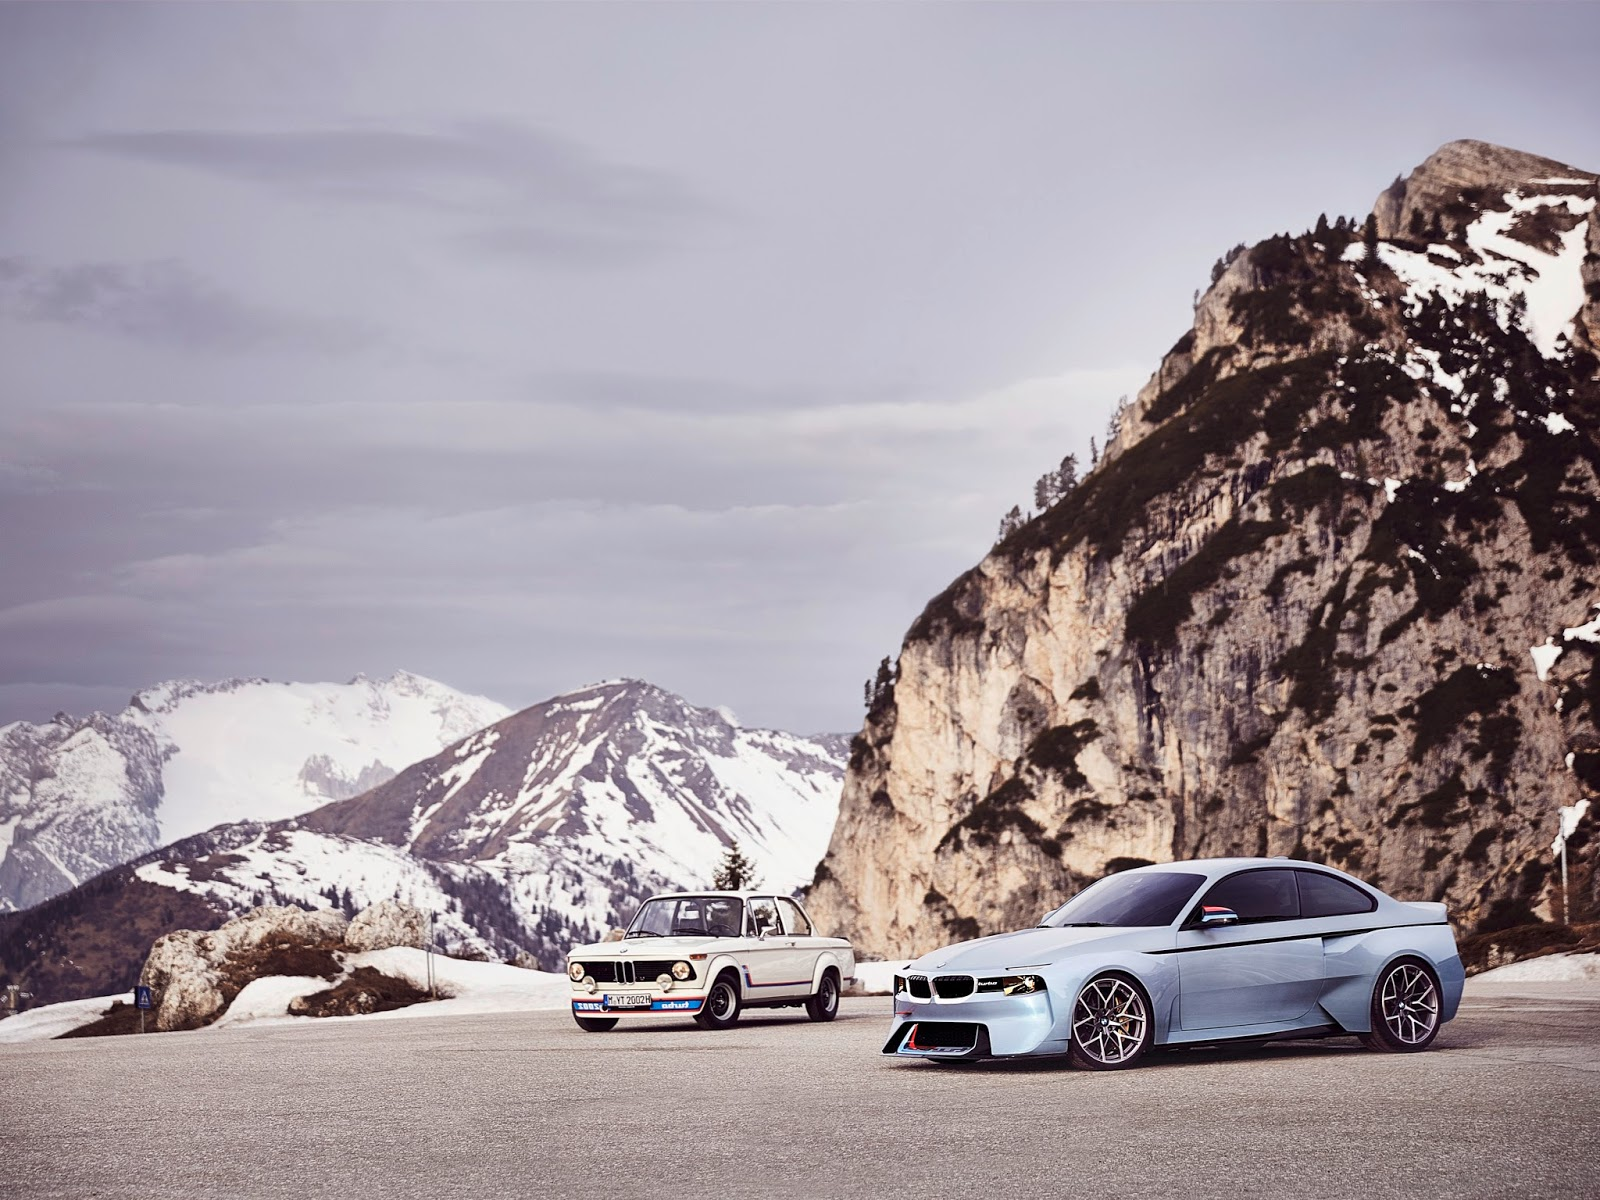 P90219724 highRes bmw 2002 hommage 05 1 2 H BMW γιορτάζει τα 50 χρόνια της θρυλικής 2002 turbo και παρουσιάζει την Bmw 2002 Hommage BMW, BMW 2002, BMW 2002 turbo, BMW Concept, BMW Hommage, supercars, videos